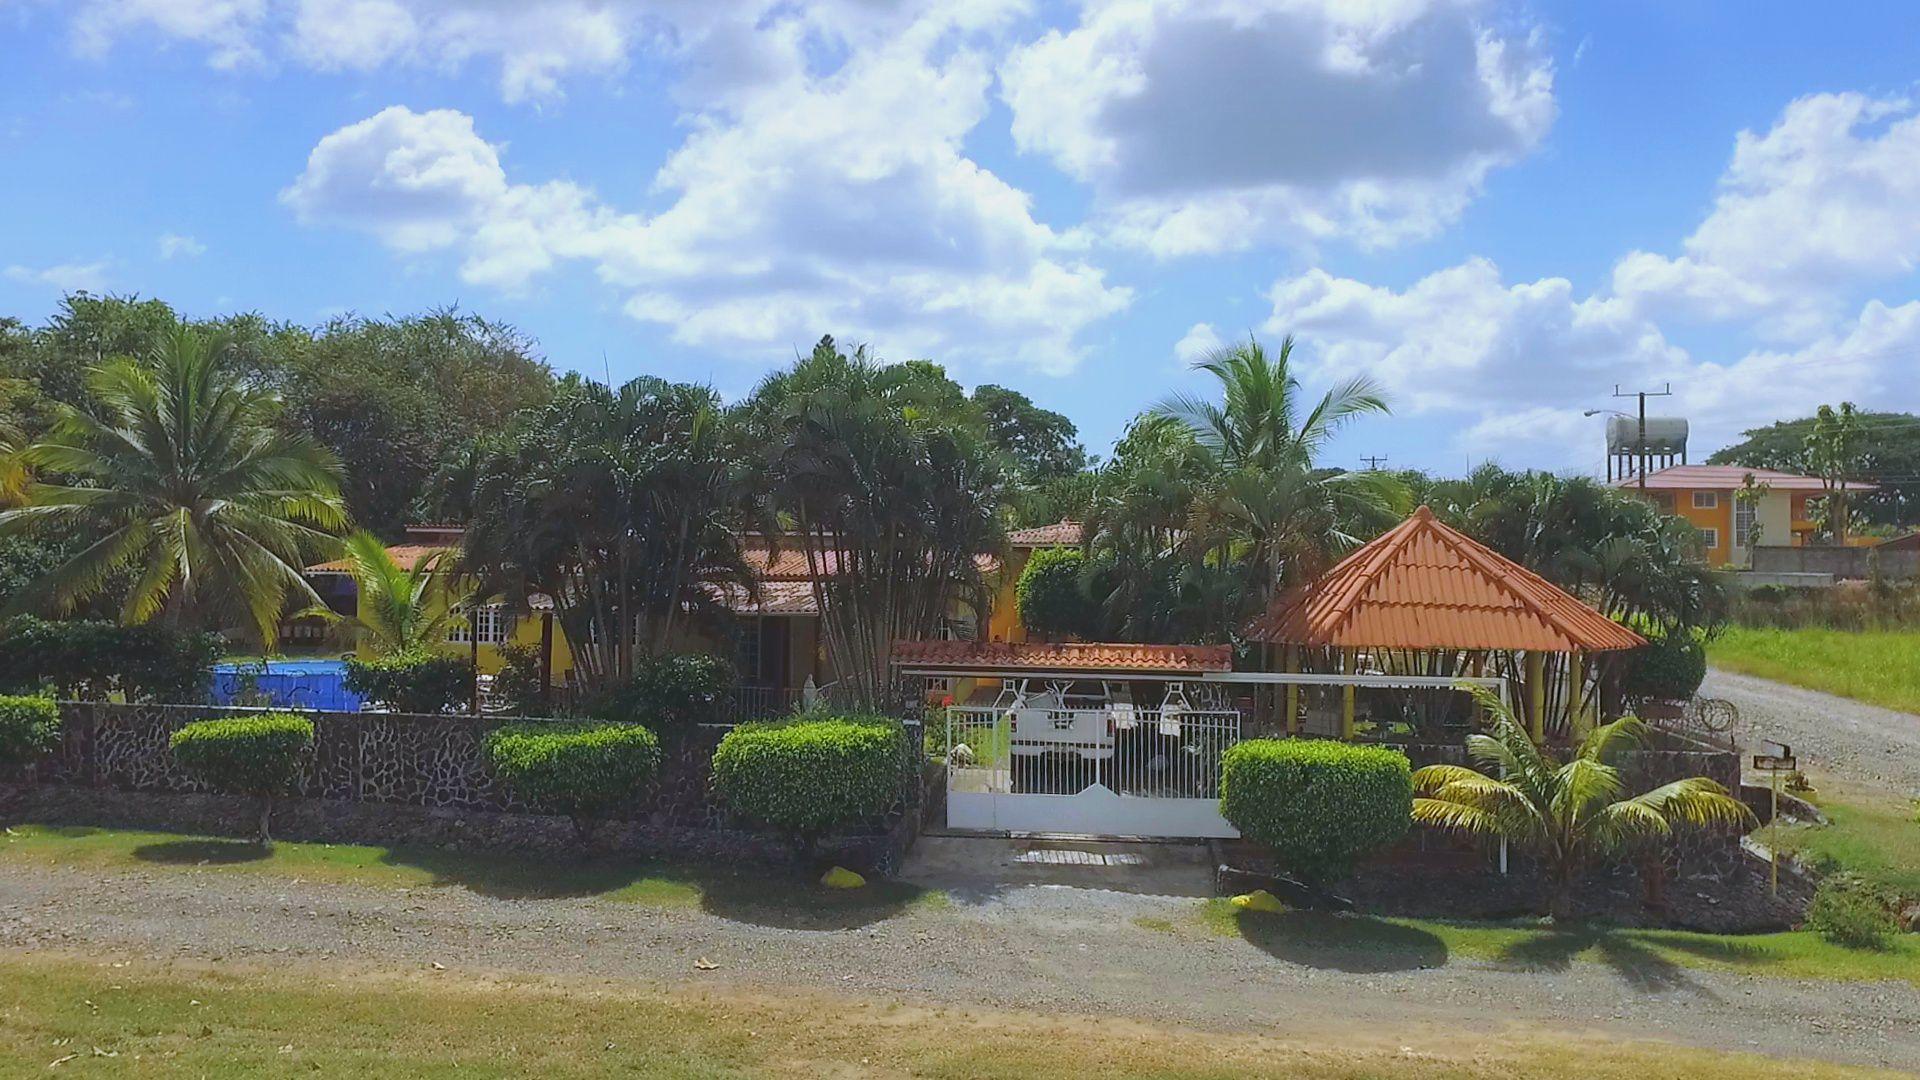 Main Photo: Home for Sale in Nueva Gorgona